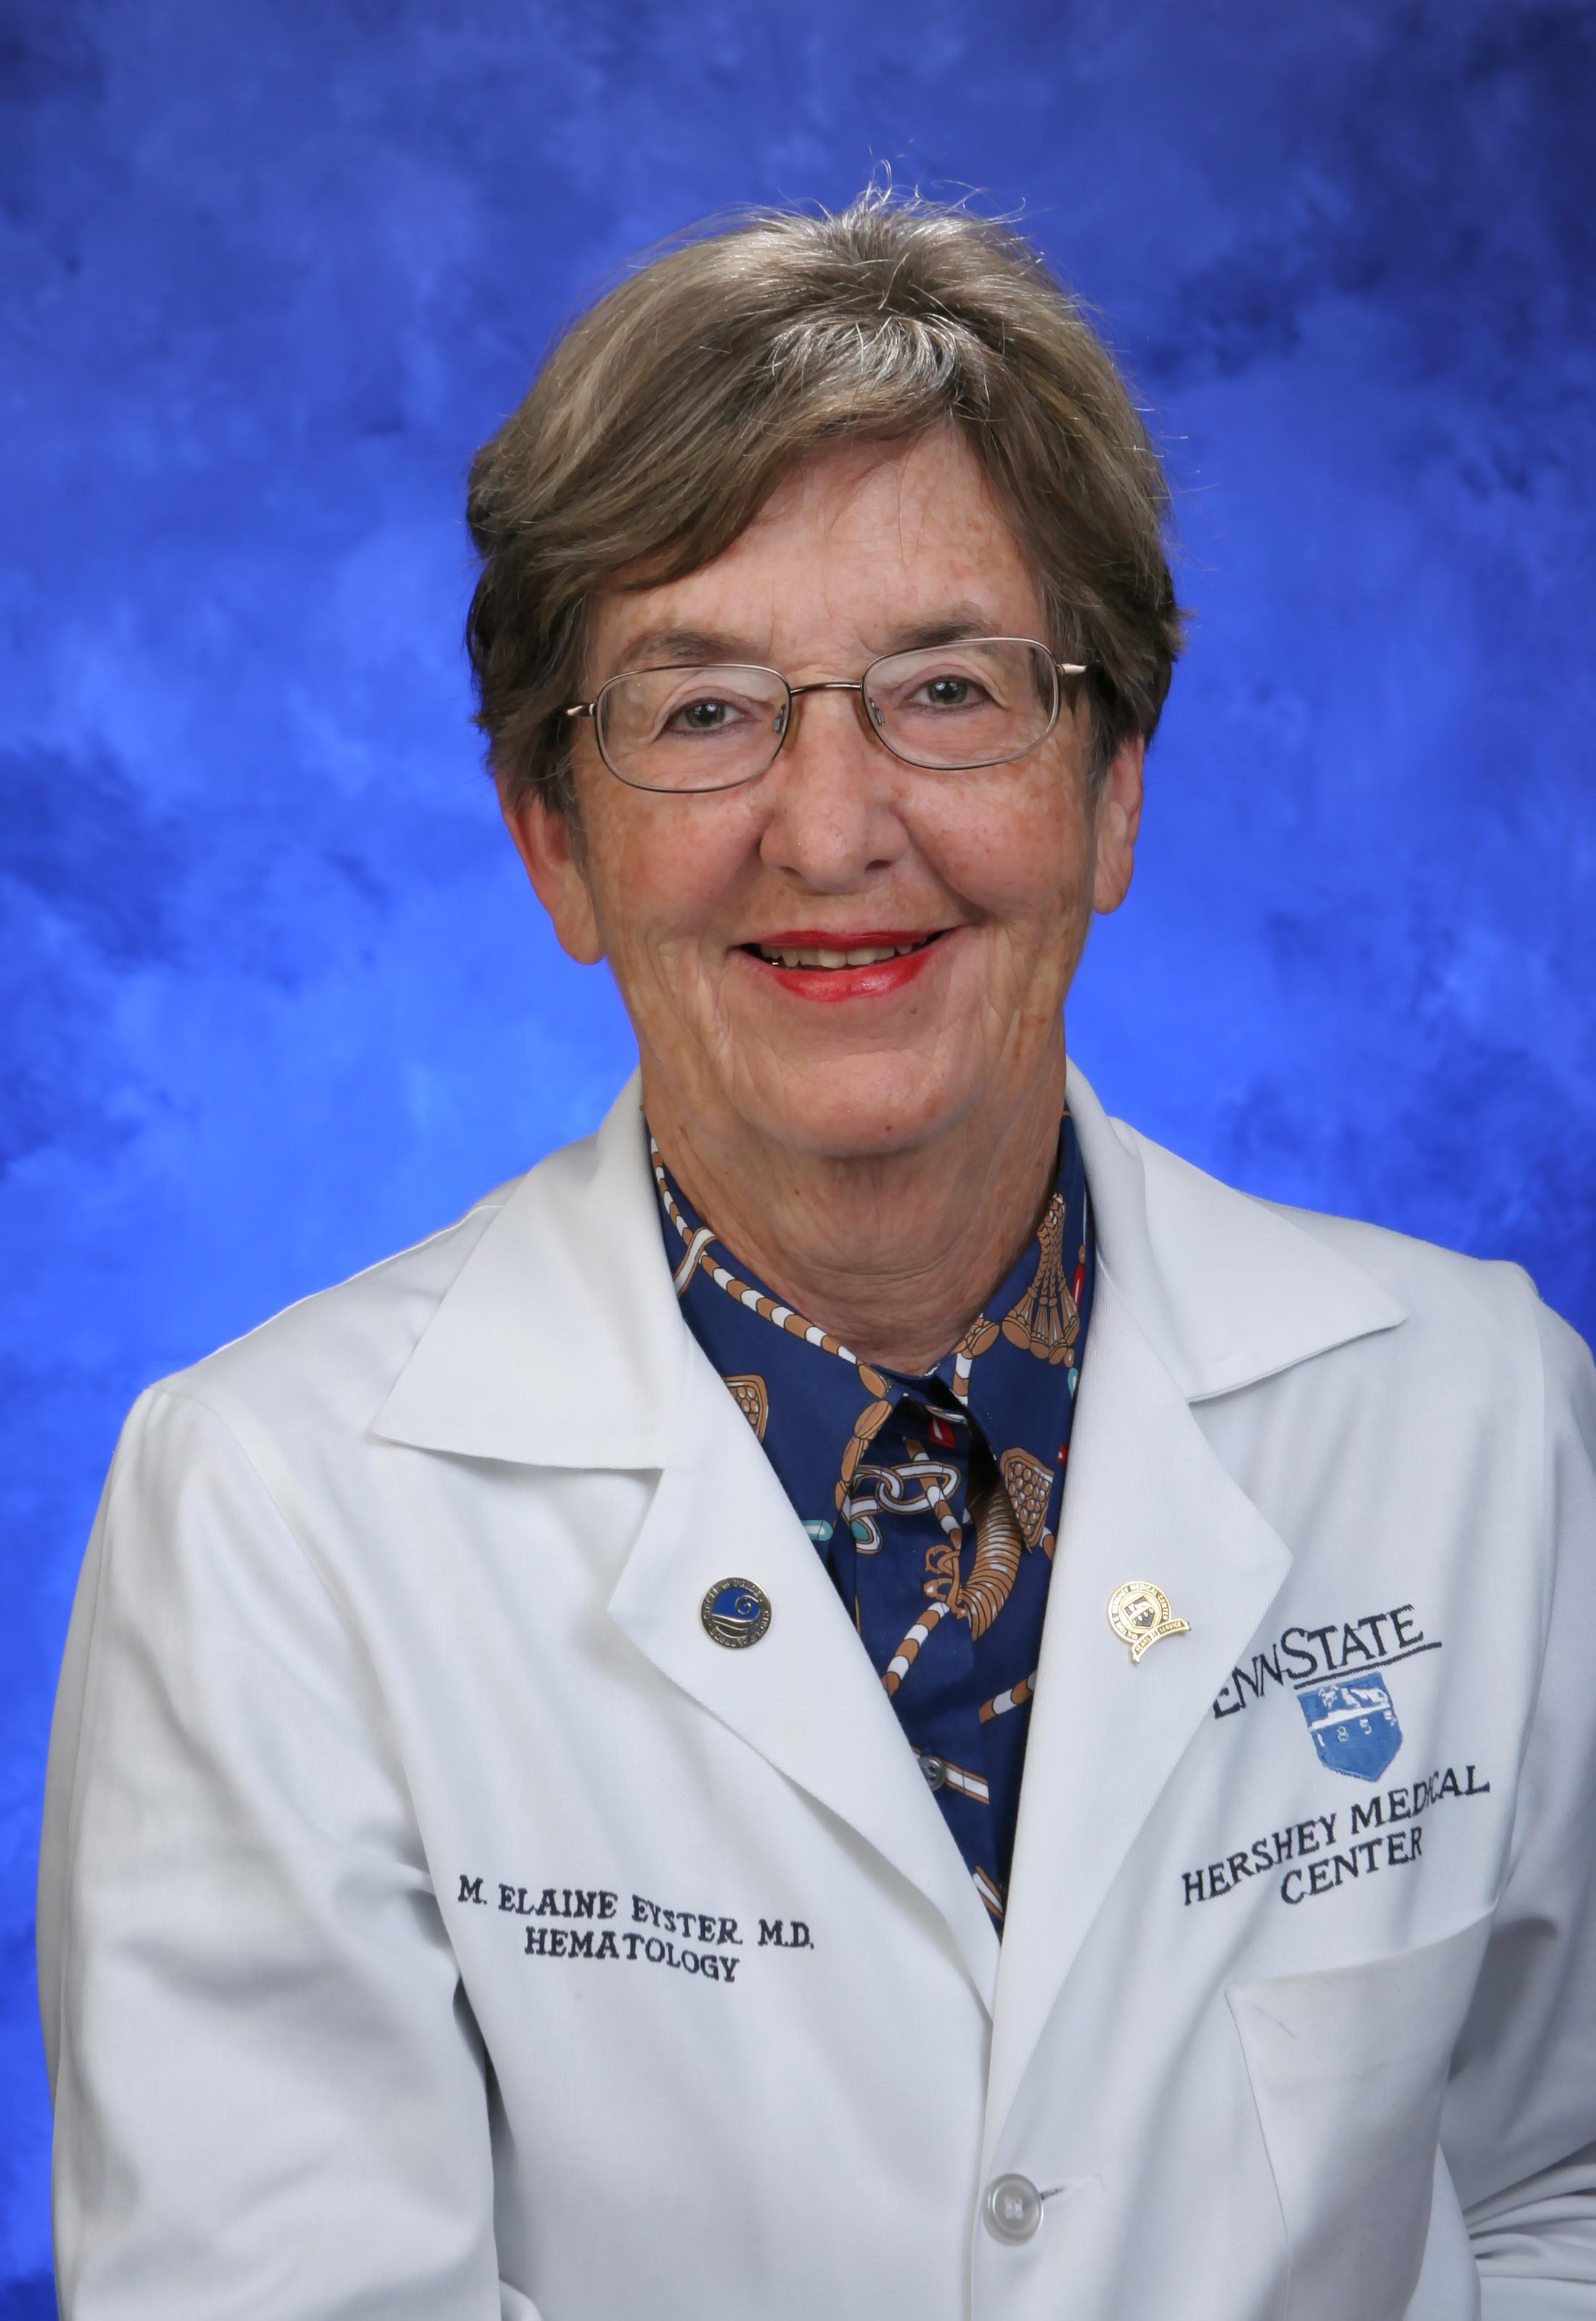 Dr. Elaine Eyster